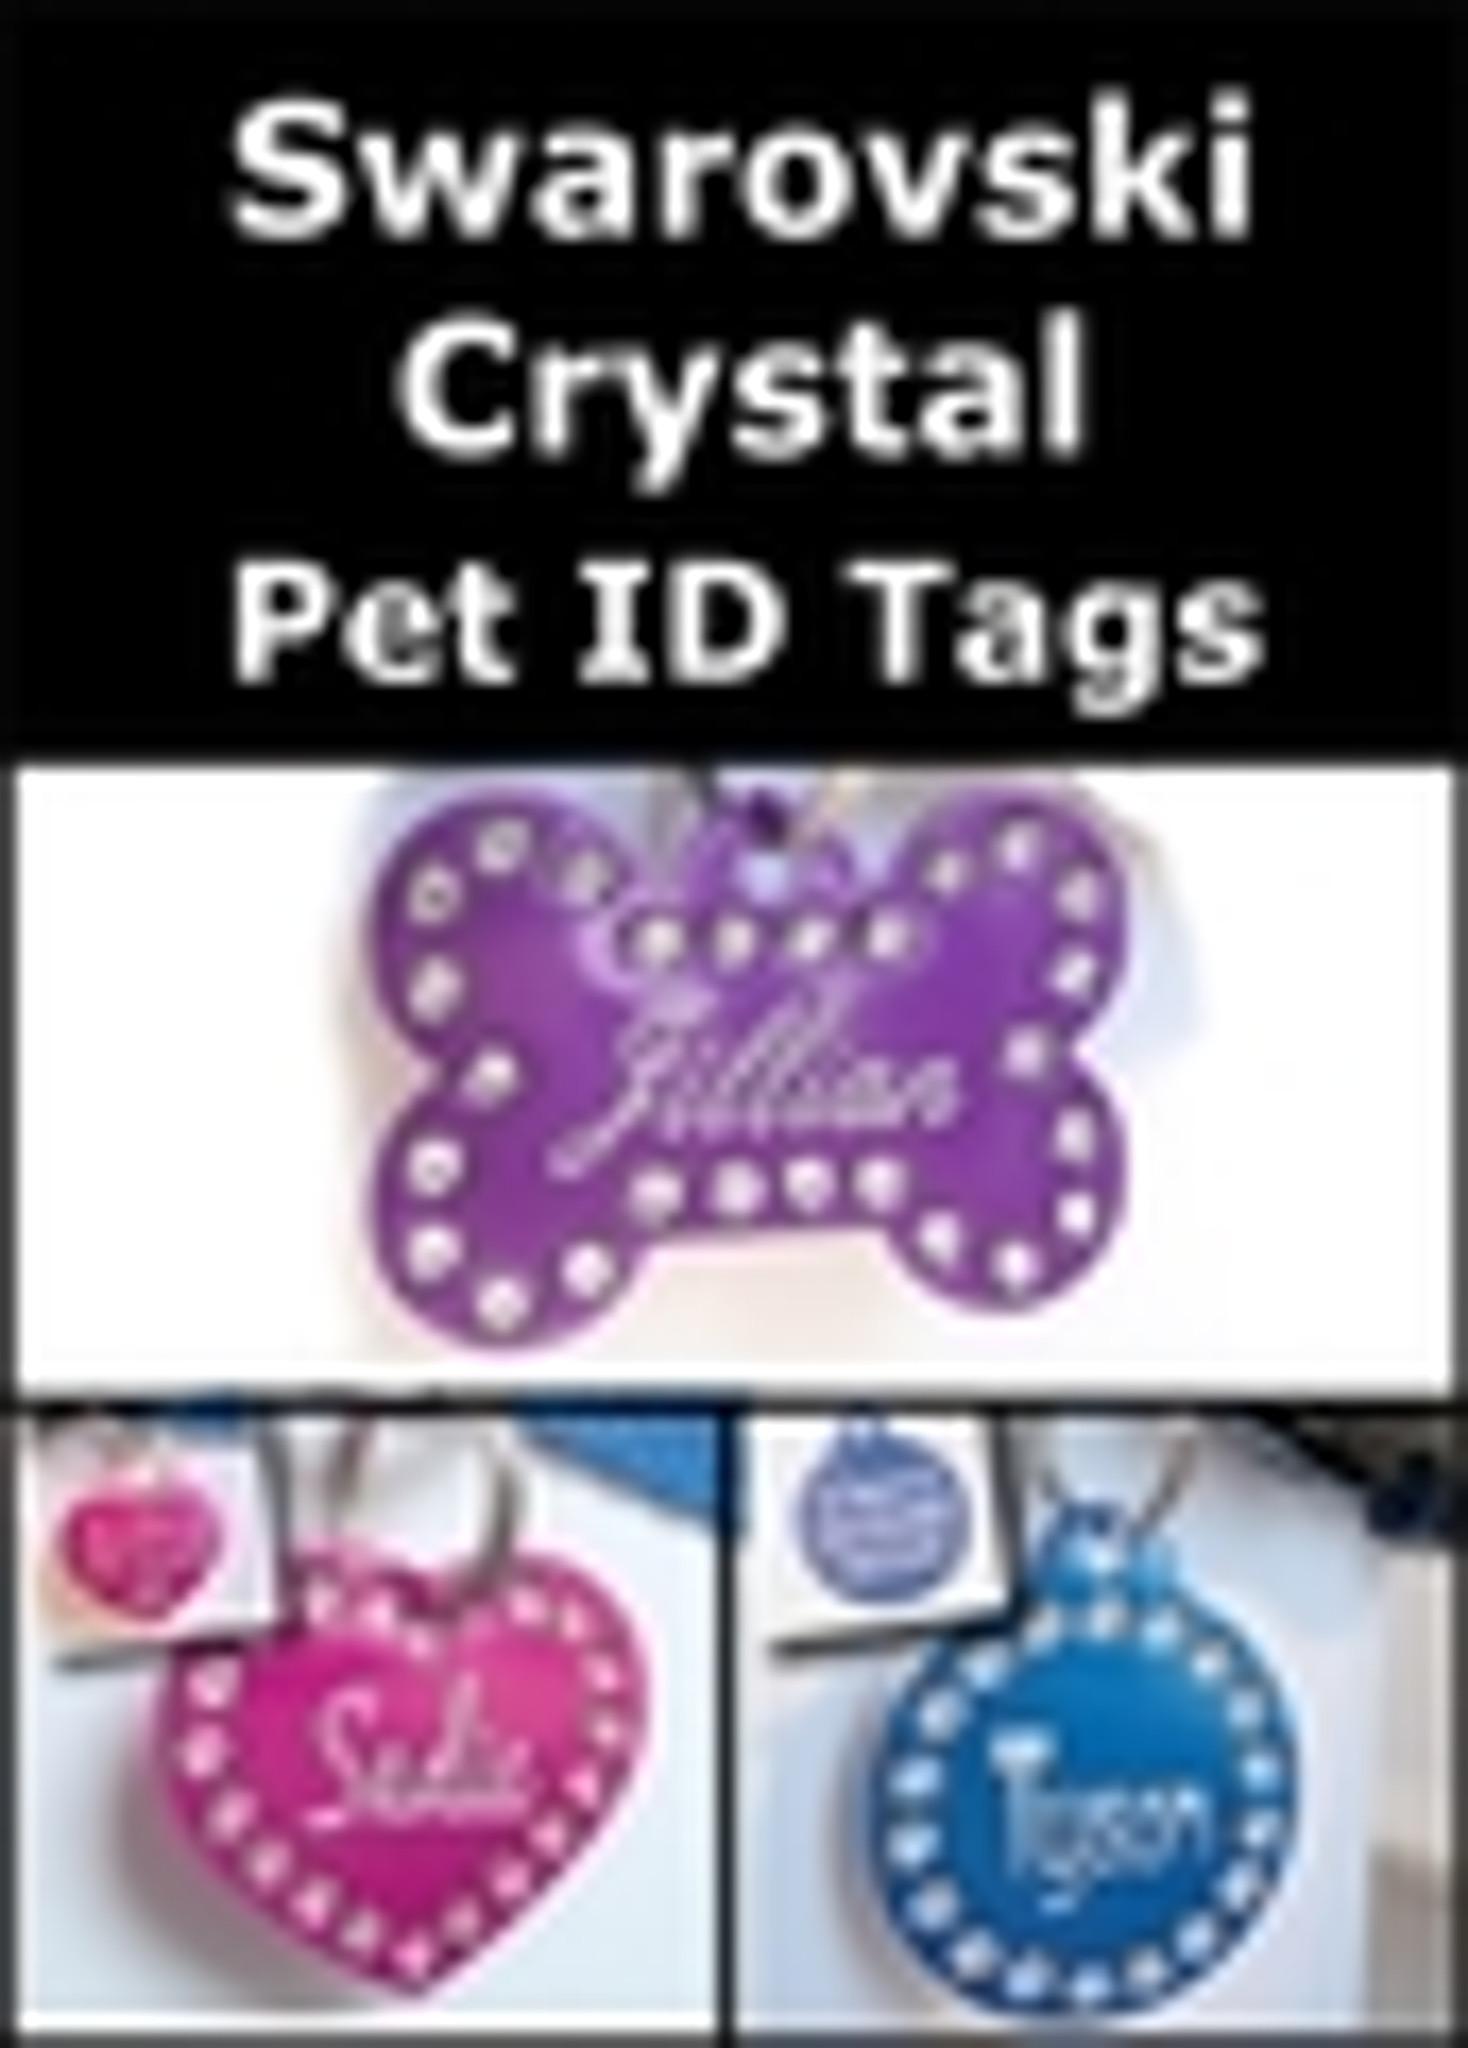 Swarovski Crystal Pet ID Tags